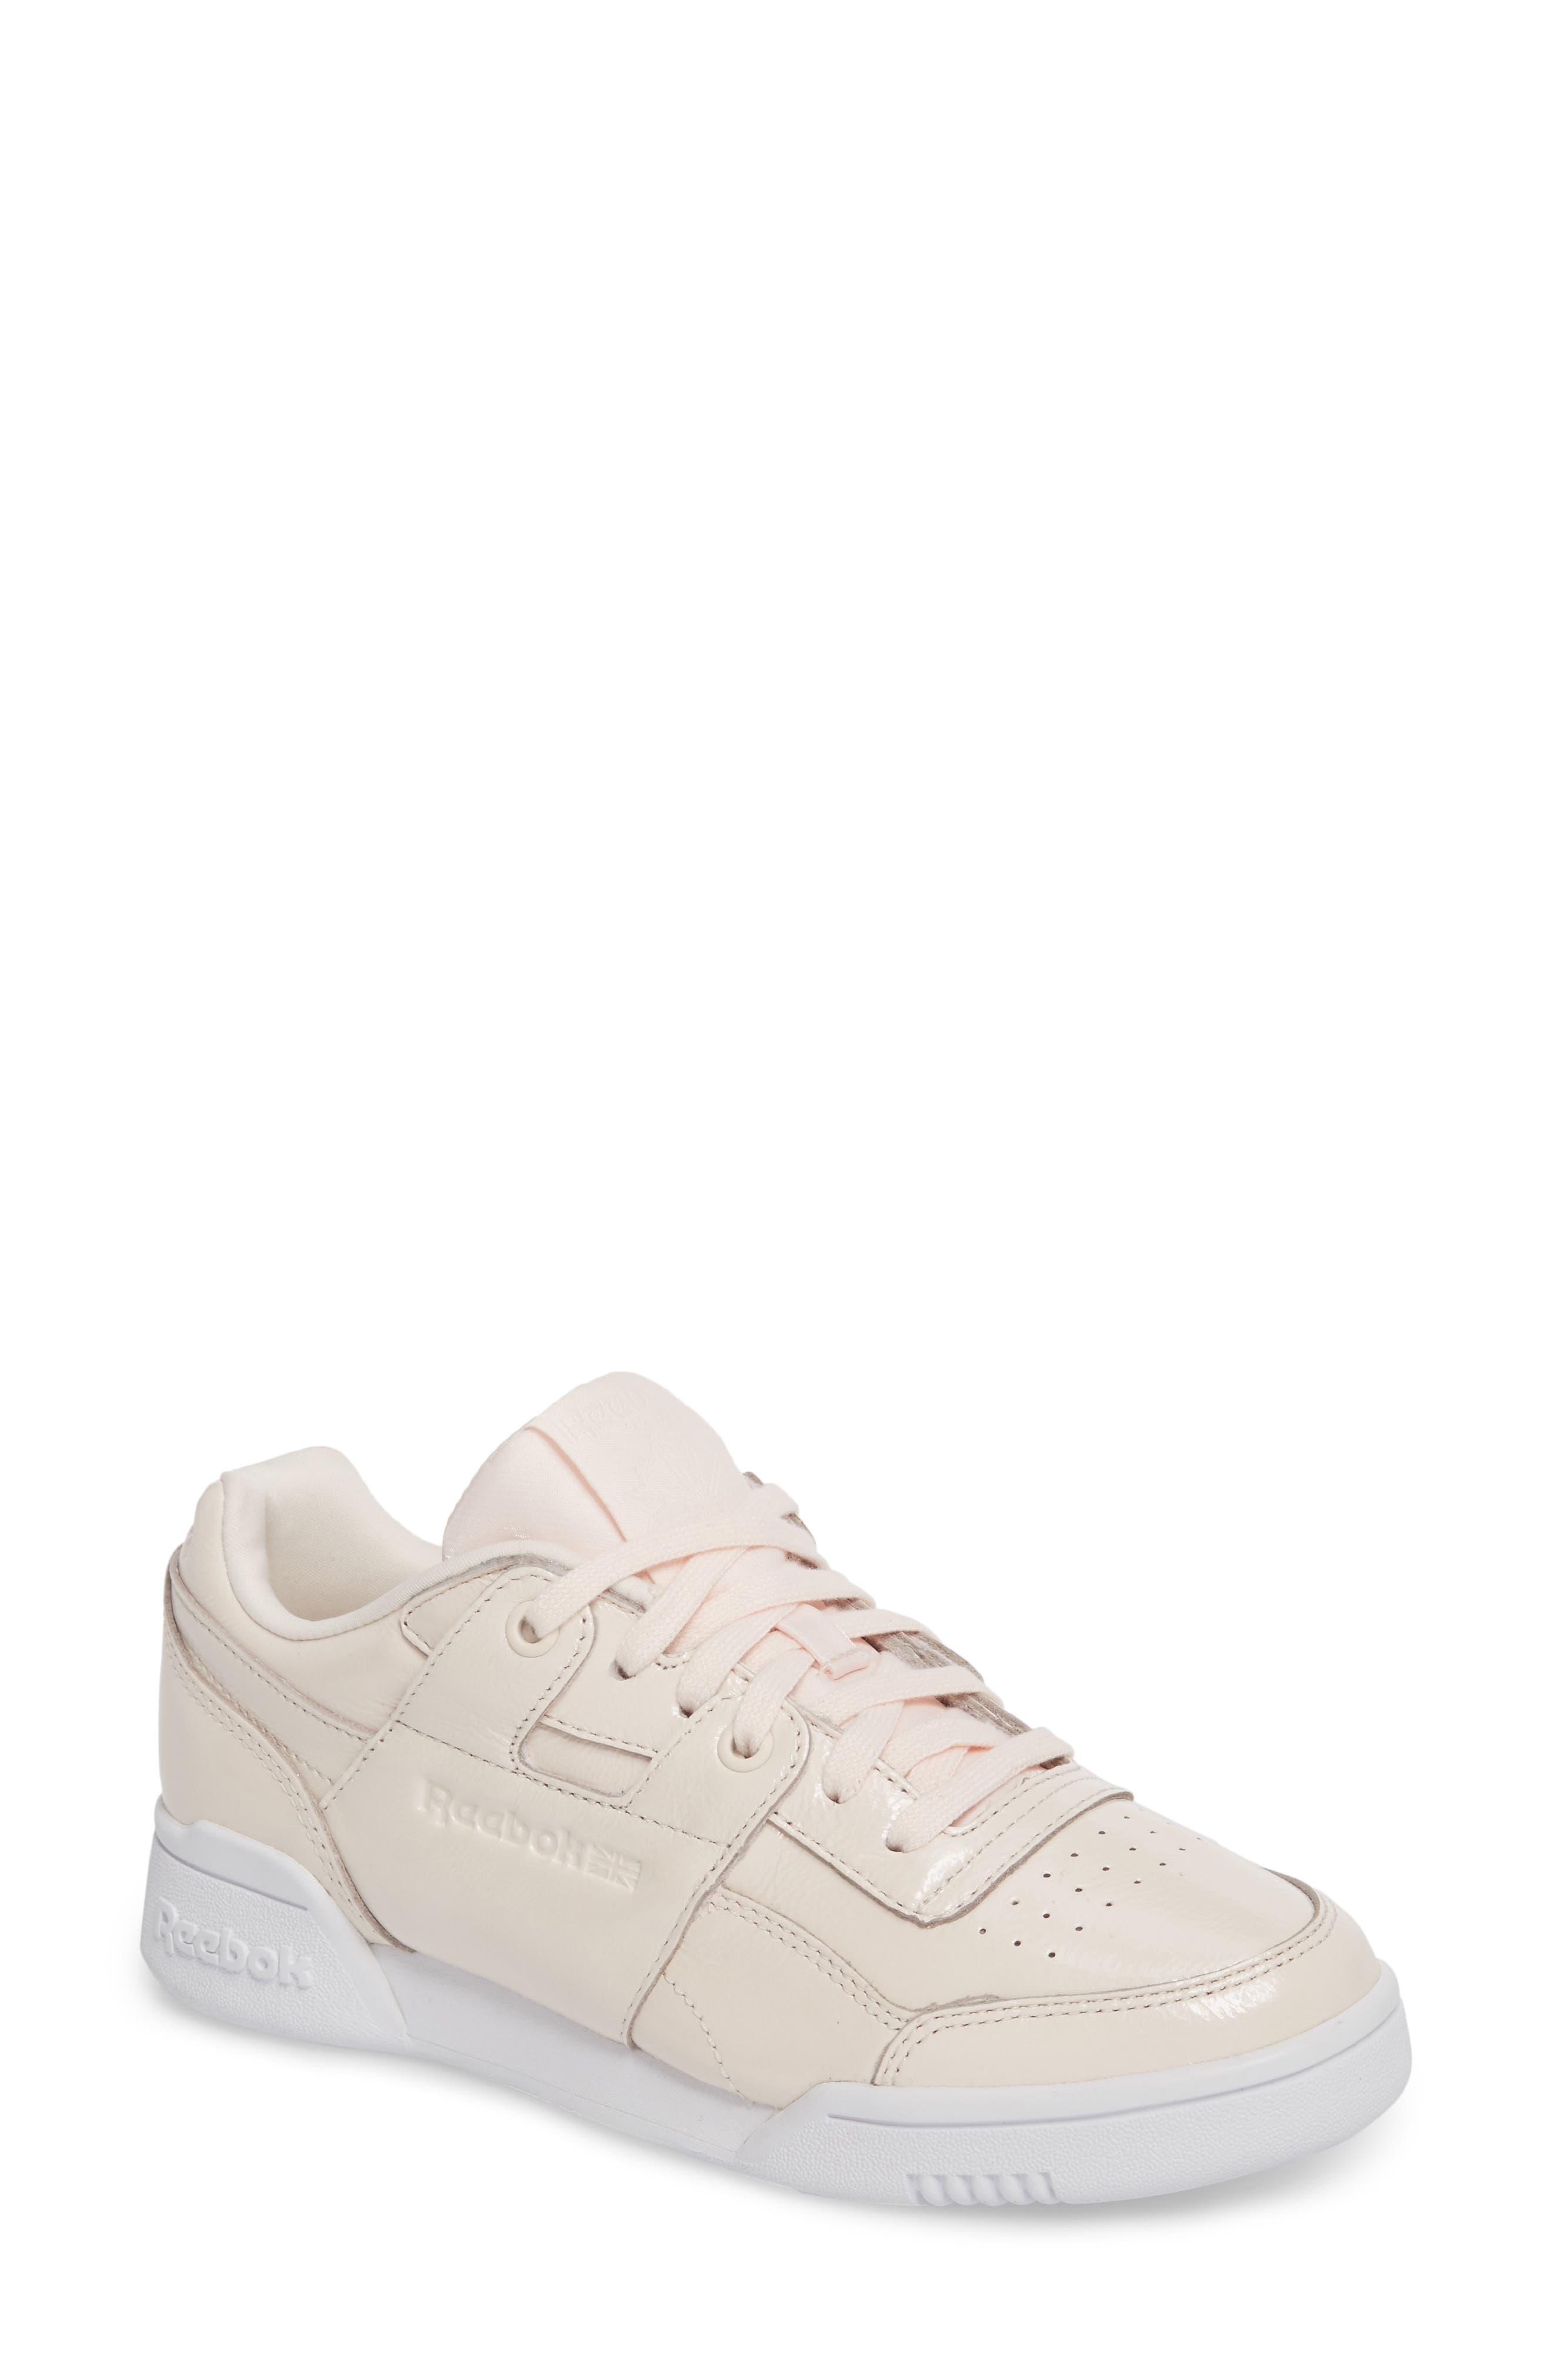 Workout Lo Plus Iridescent Sneaker,                         Main,                         color, 650